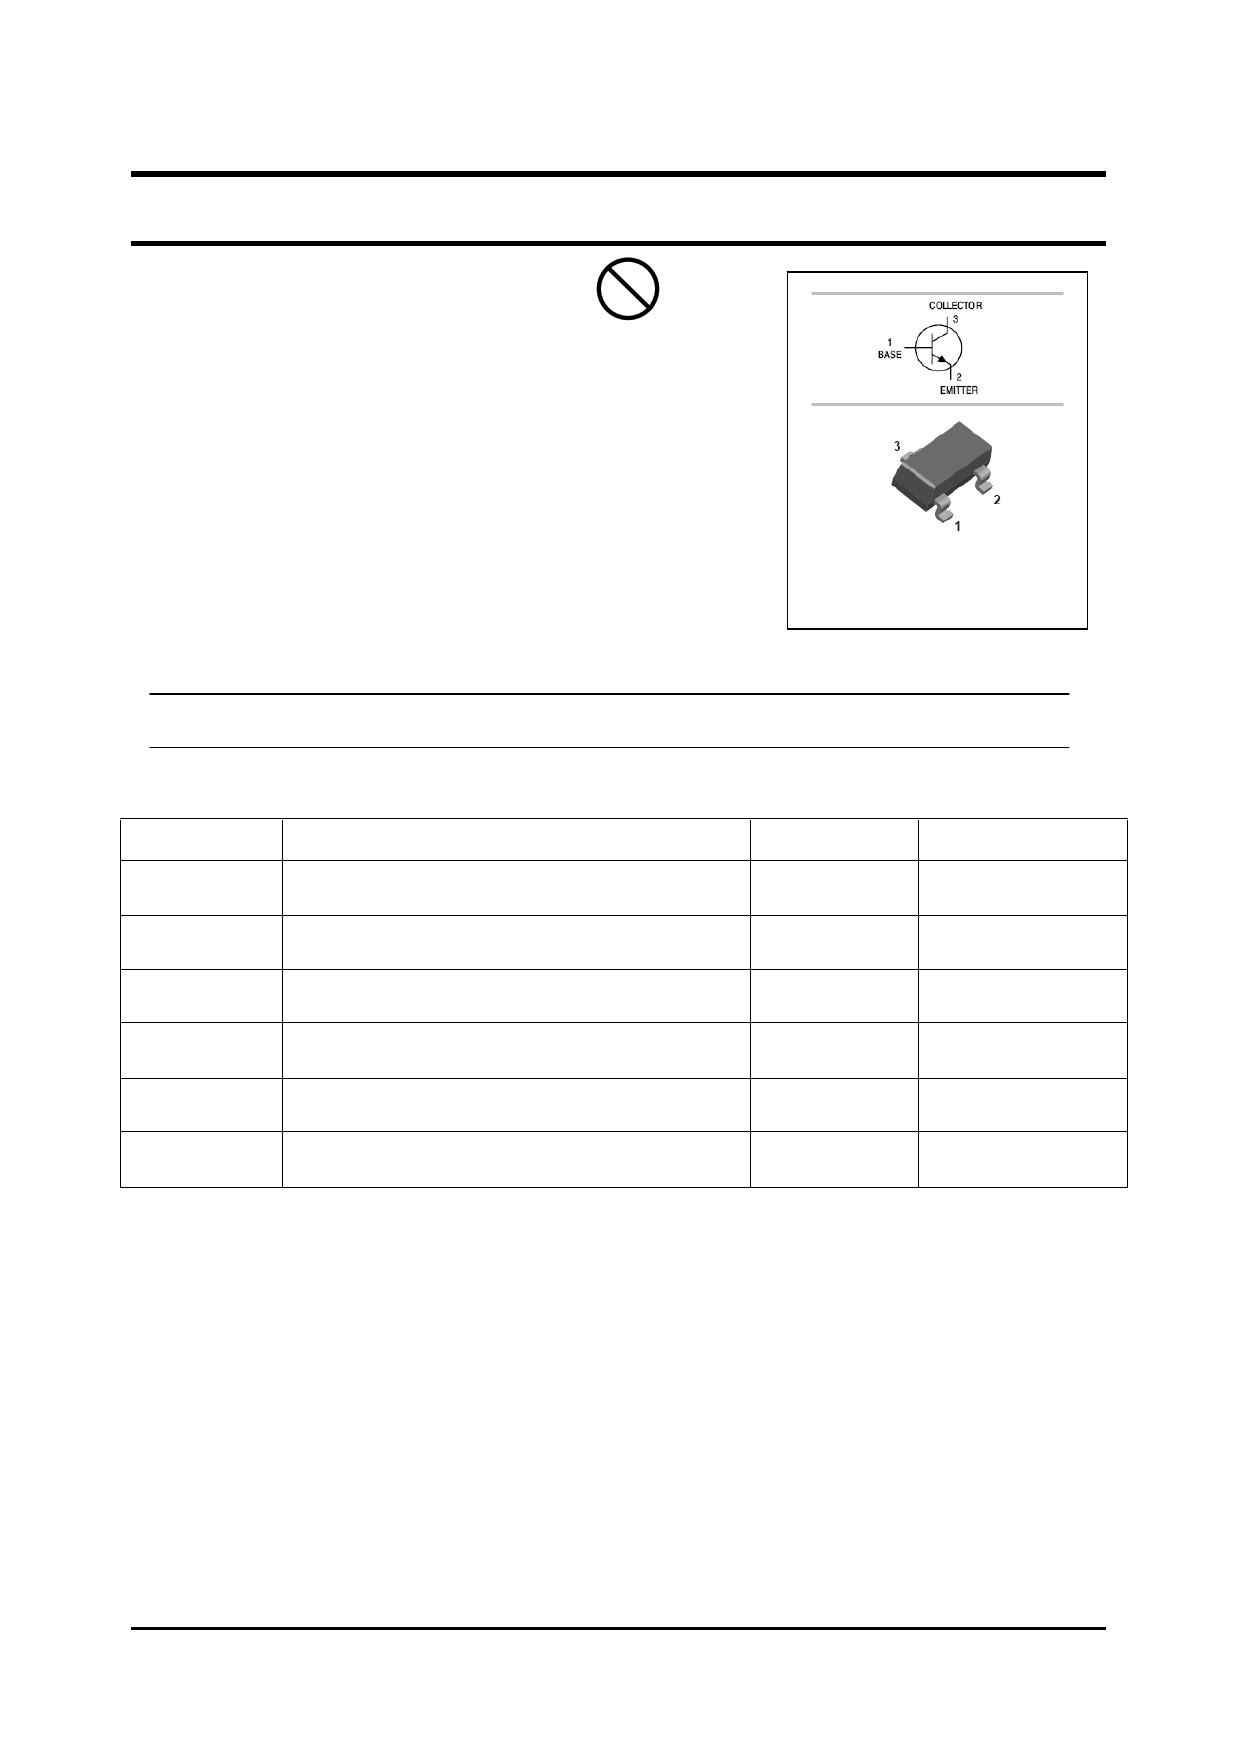 2SC1654 datasheet